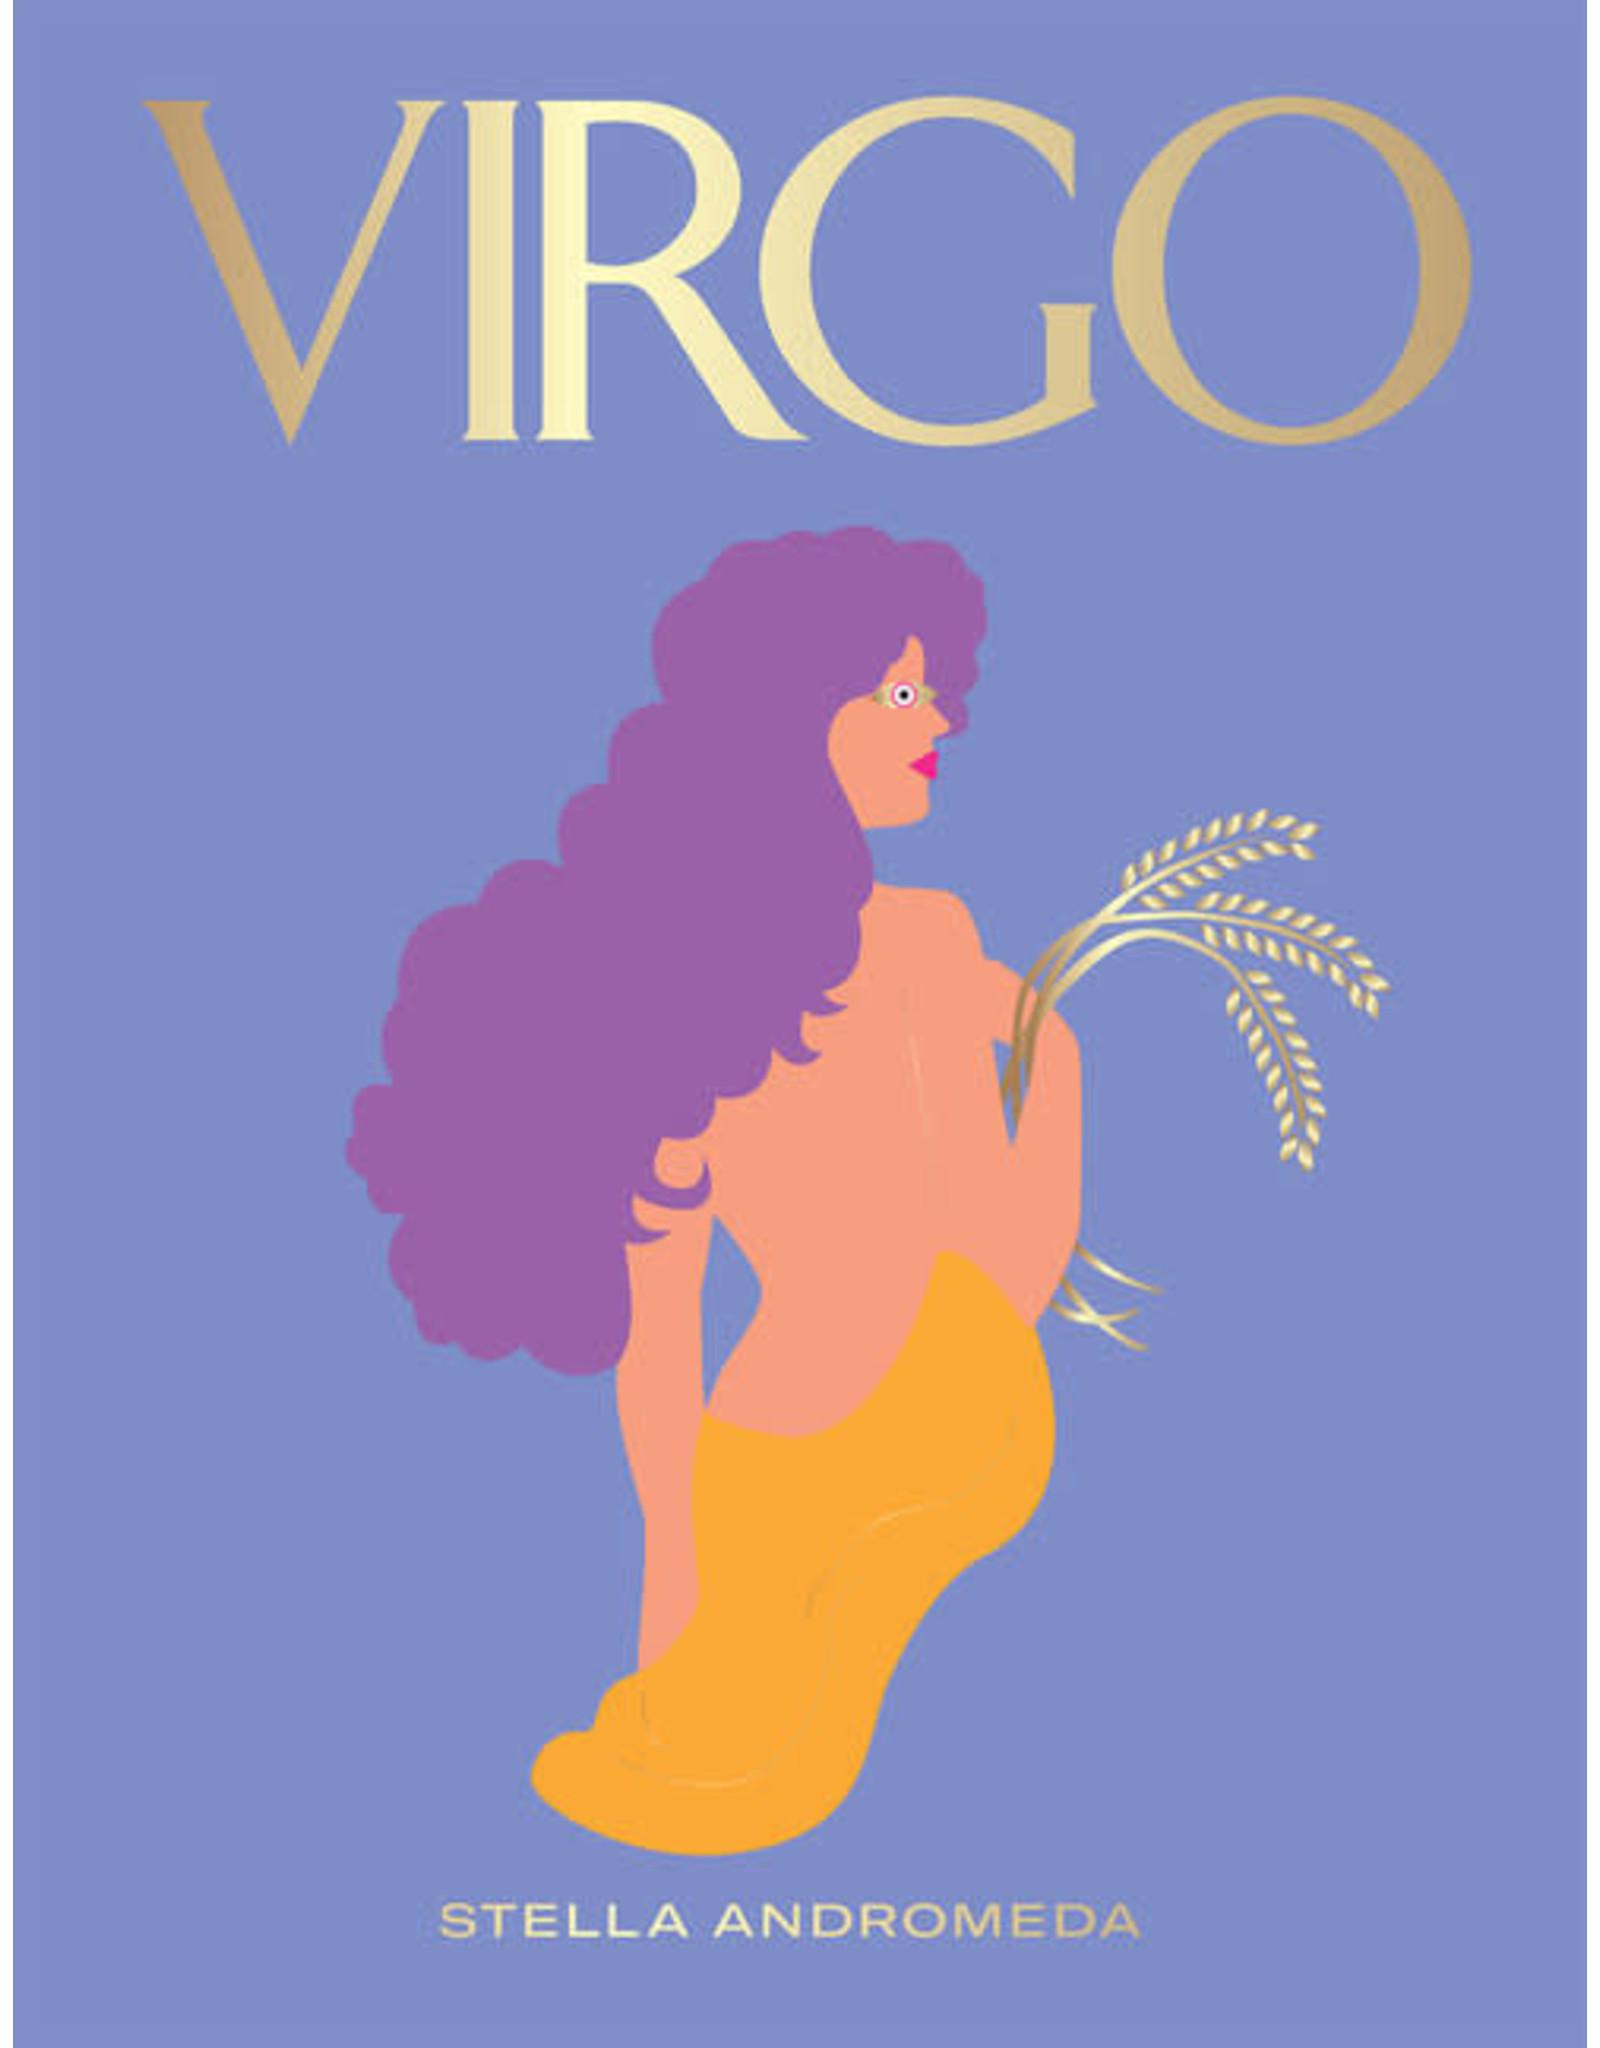 RST - Virgo